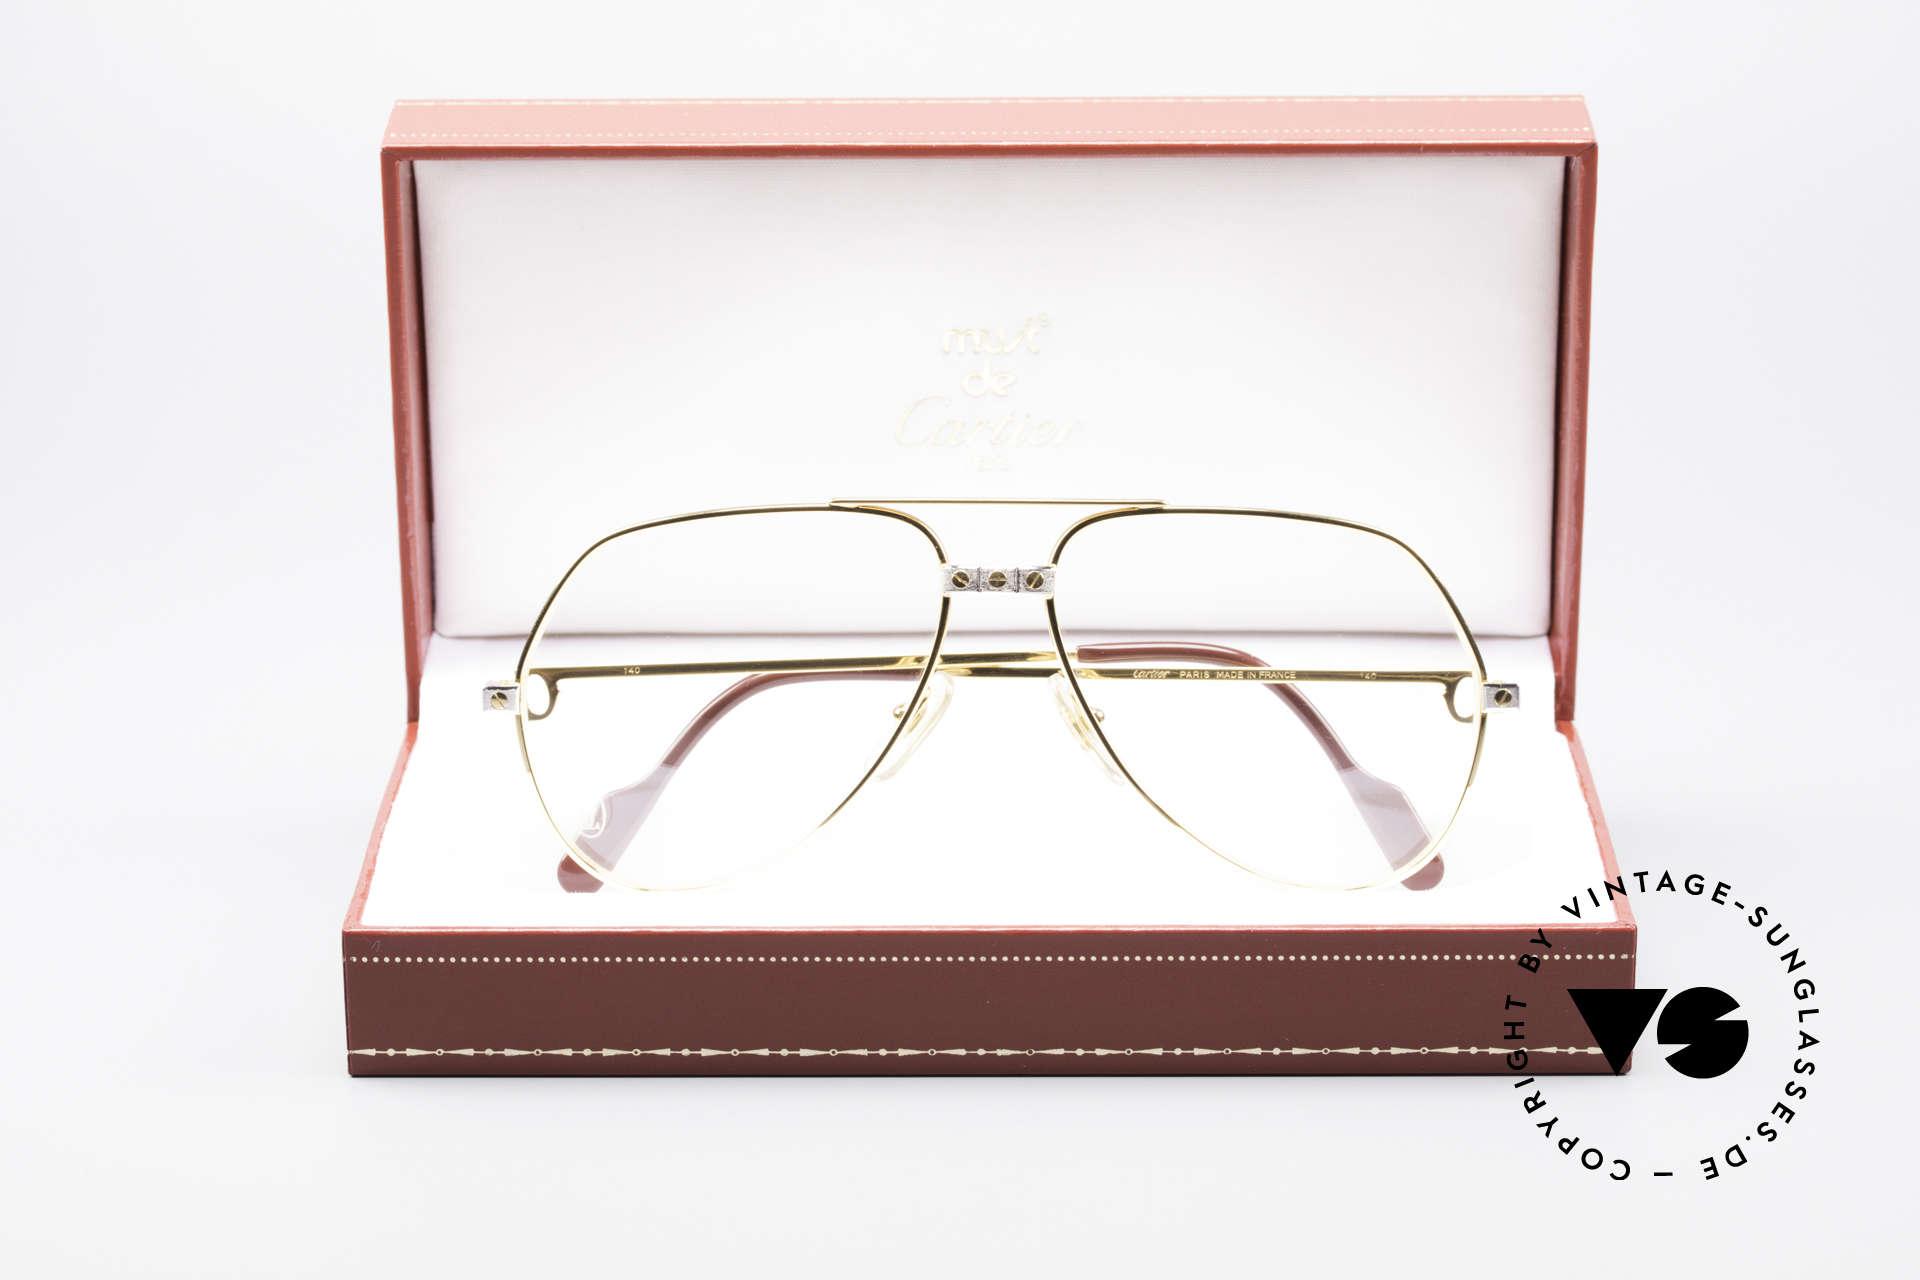 Cartier Vendome Santos - M James Bond Glasses Original, luxury frame (22ct gold-plated) with full orig. packing!, Made for Men